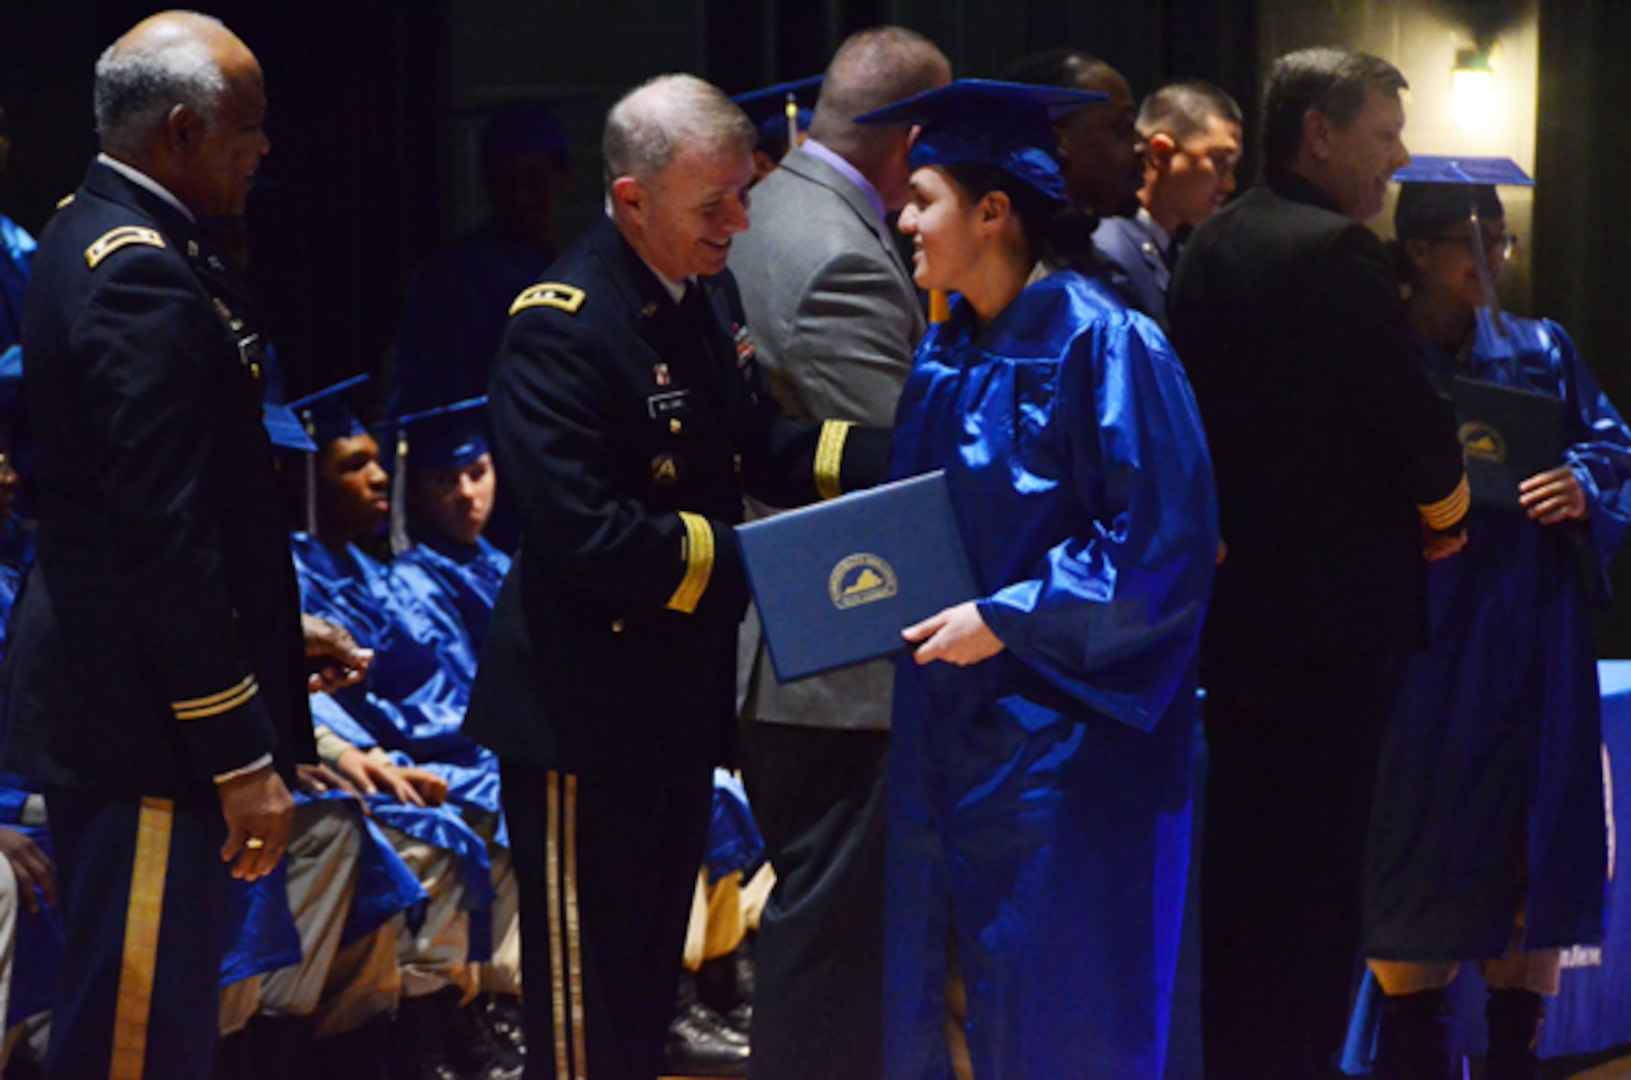 Commonwealth ChalleNGe Class 50 graduates 117 cadets